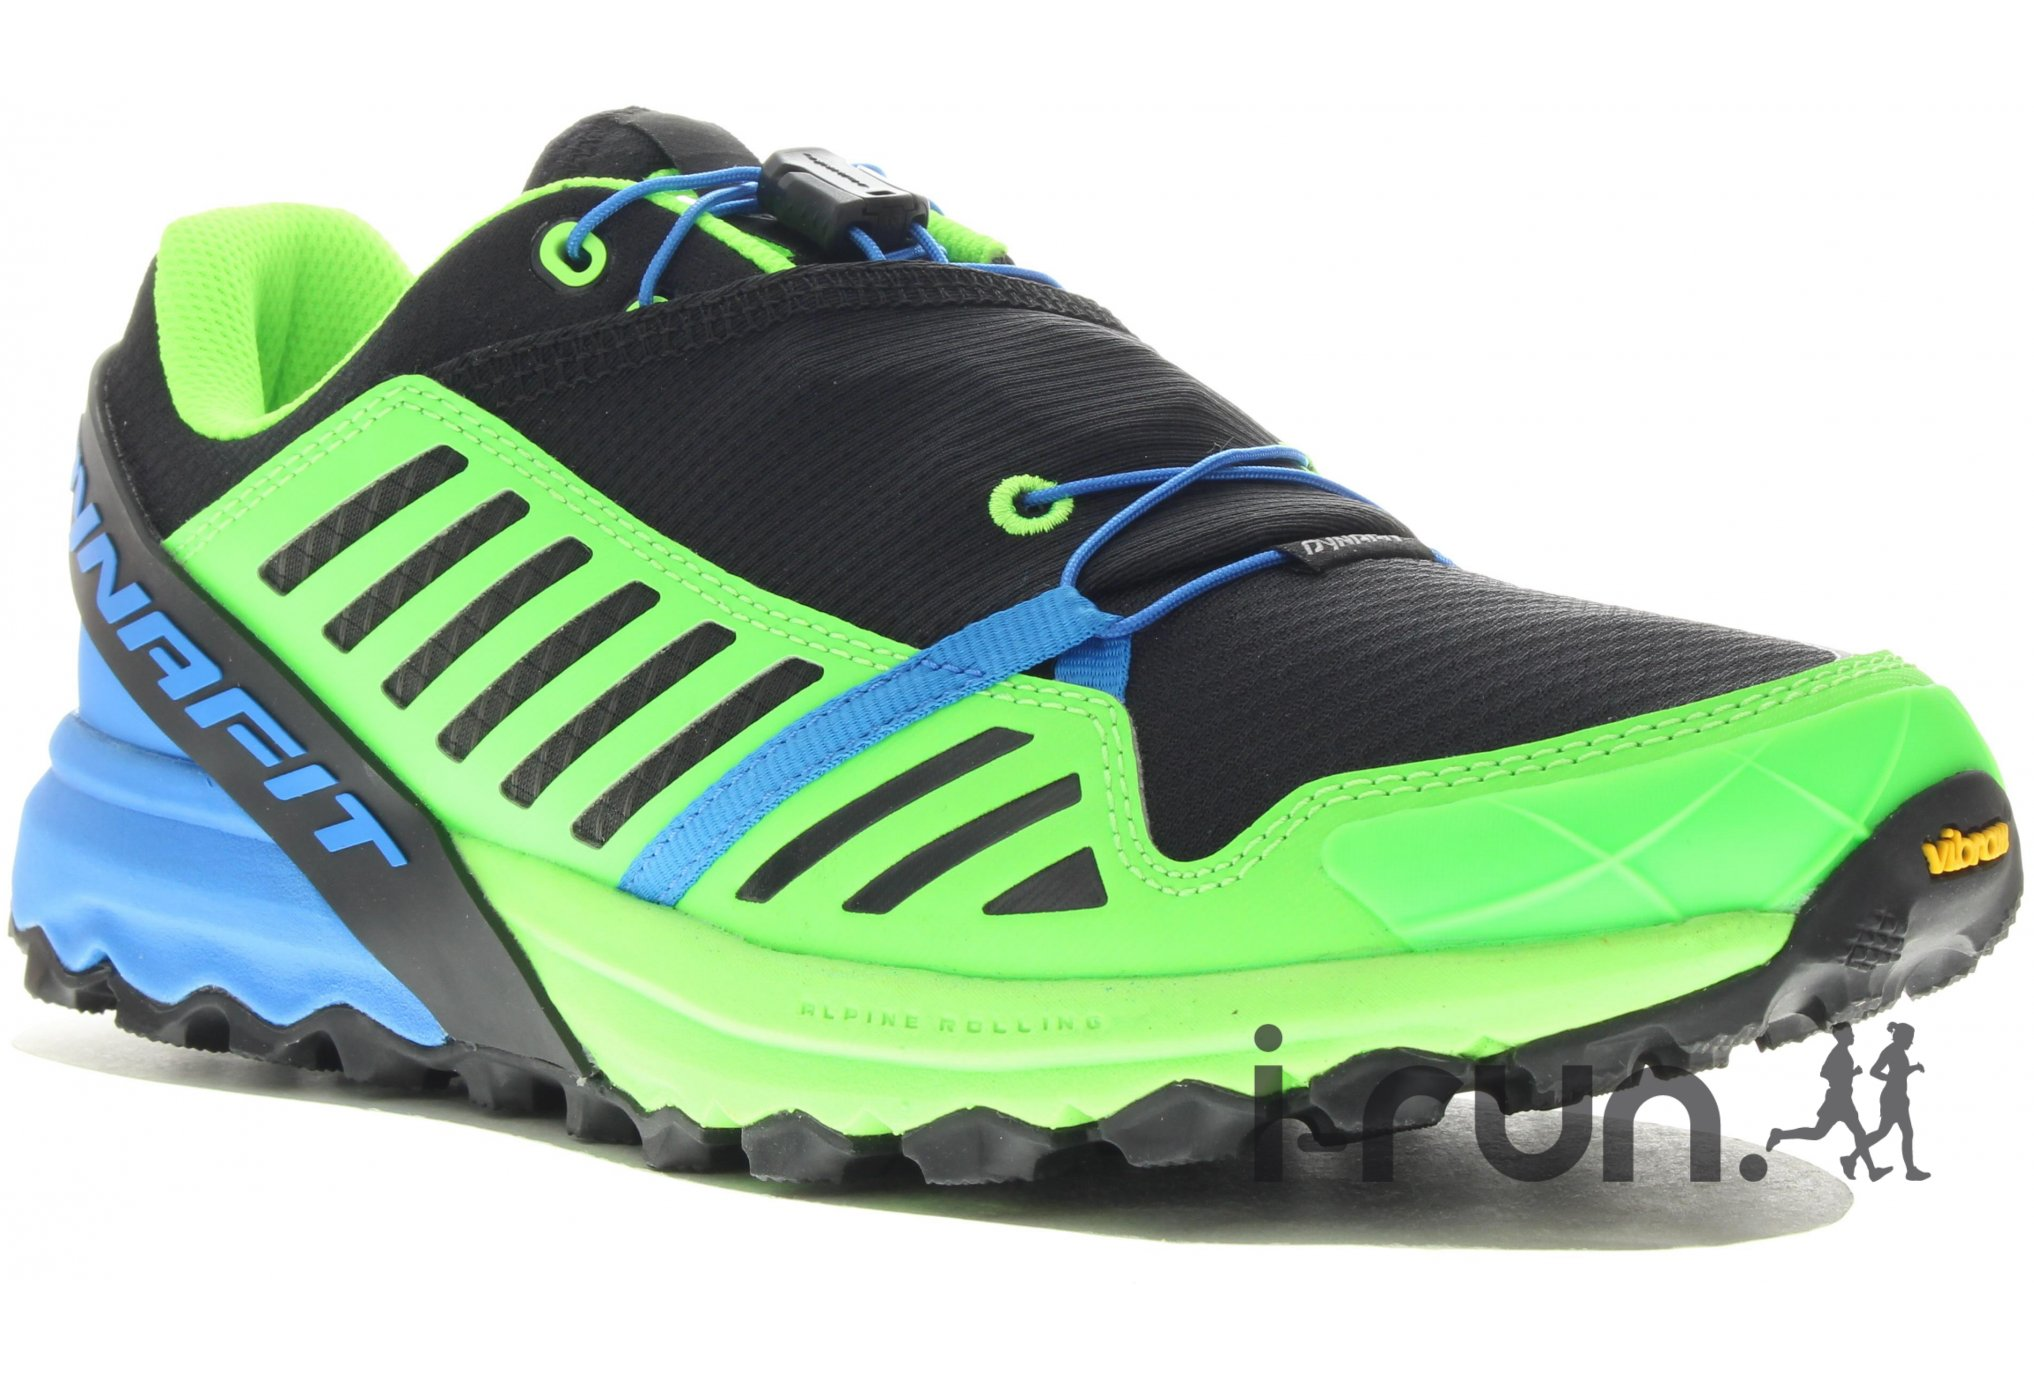 Dynafit Alpine Pro M Chaussures homme